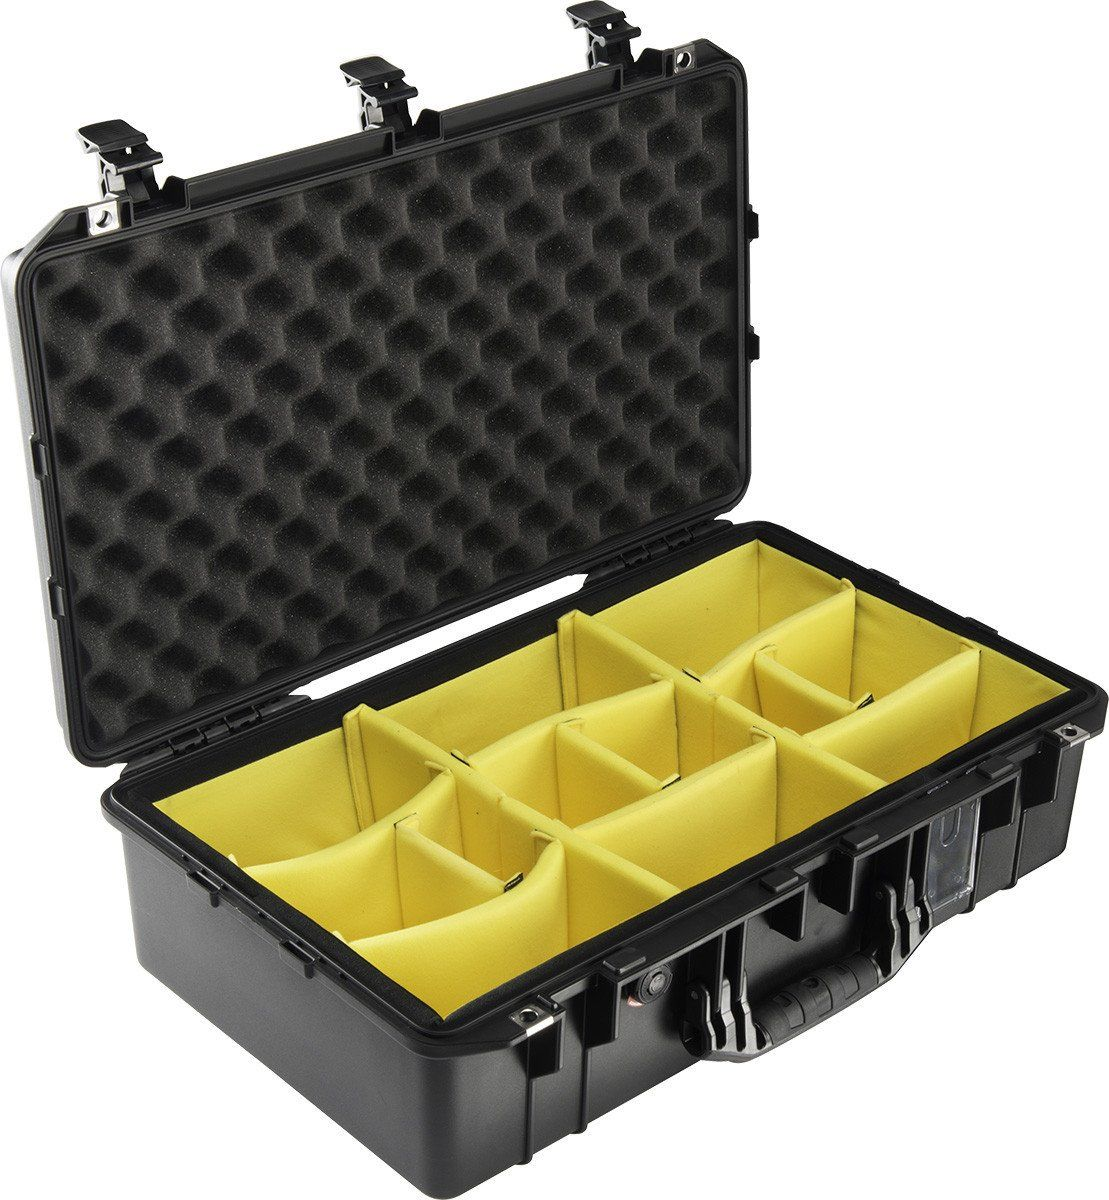 1555 Air Case Pelican case, Protective cases